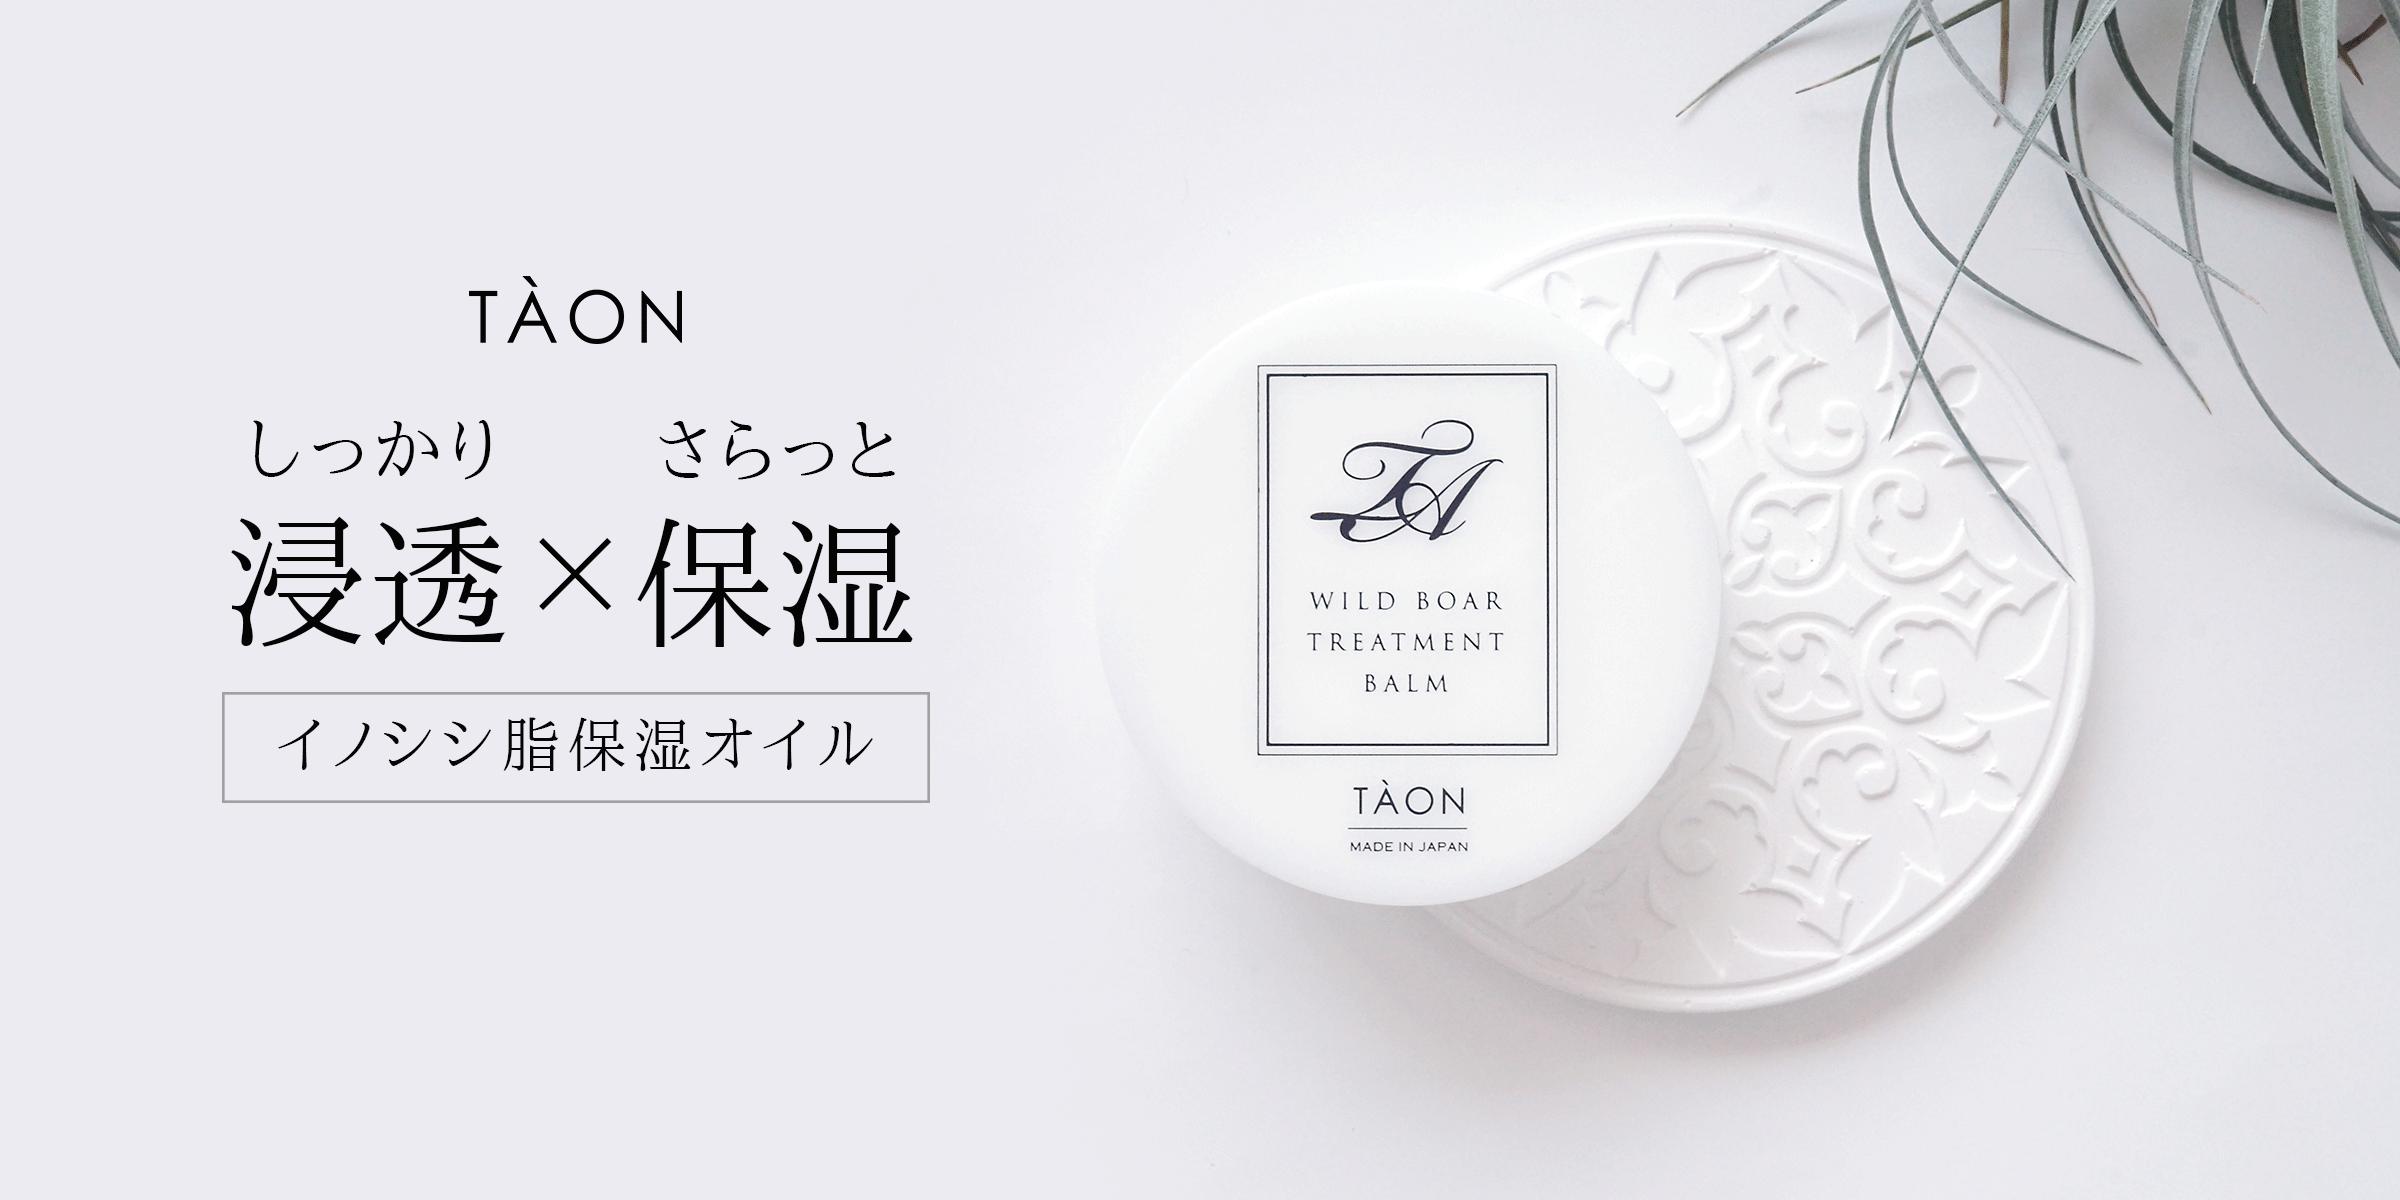 TAON タオン イノシシ クリーム 保湿オイル 乾燥肌 敏感肌 乳幼児 ママ スキンケア ボディクリーム 猪 日本